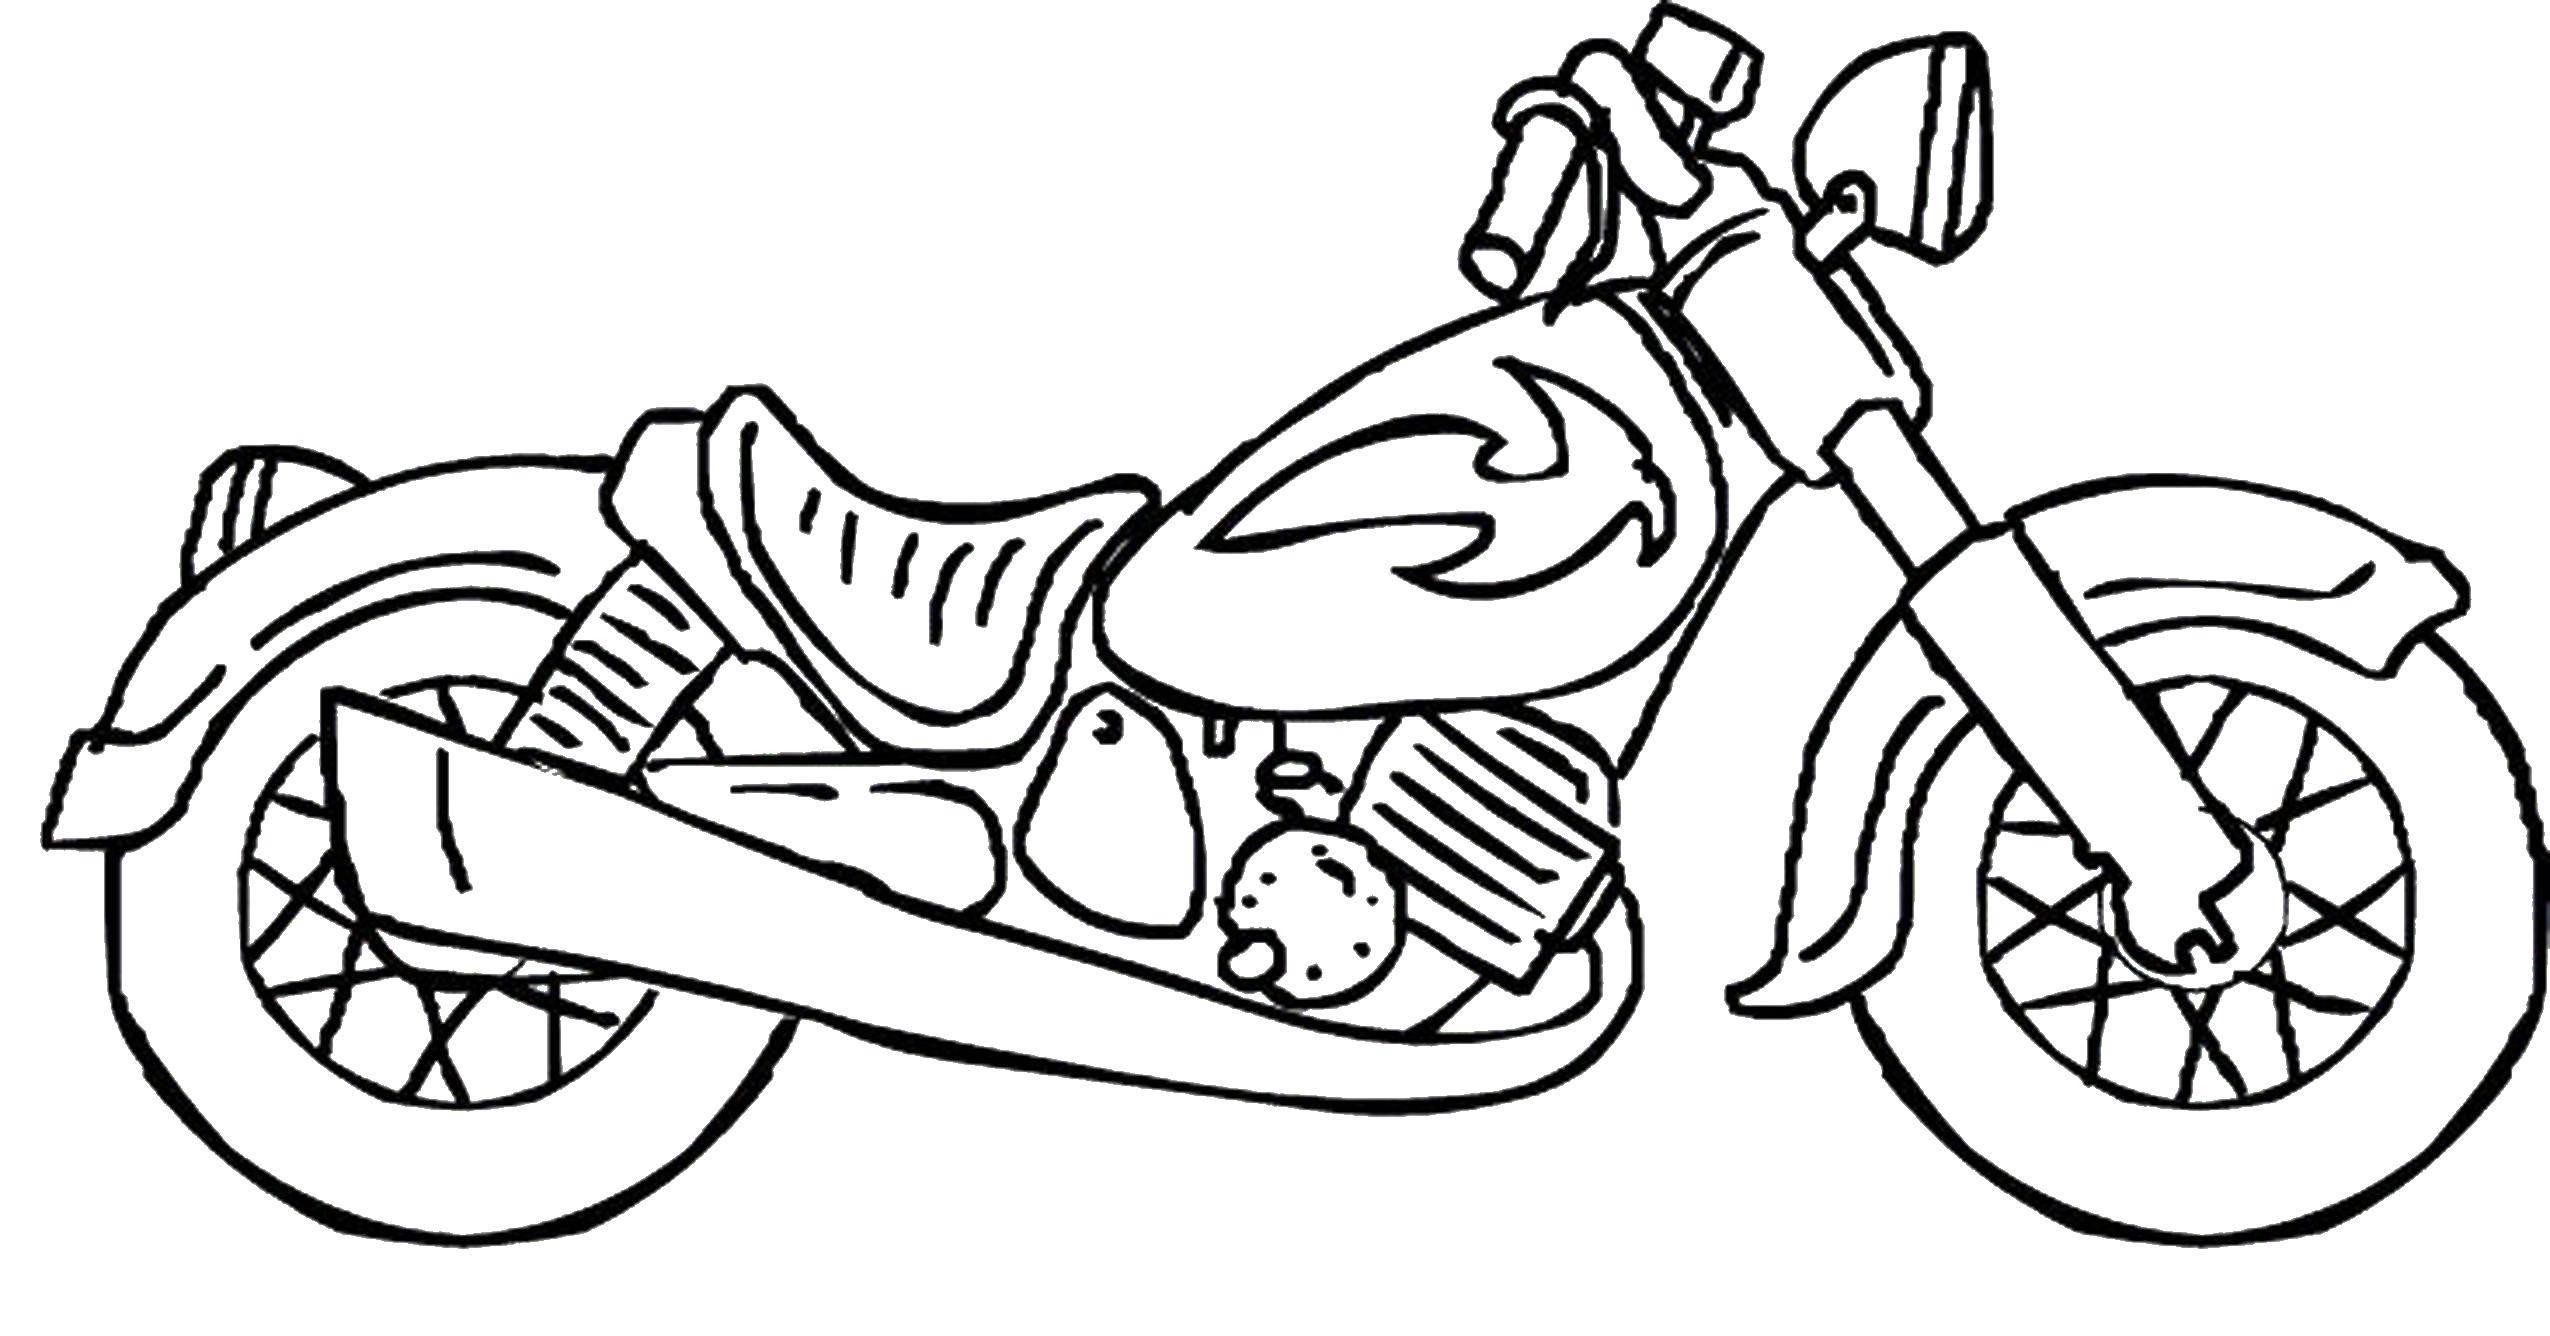 Раскраски мотоцикл, Раскраска Байкерский мотоцикл транспорт.